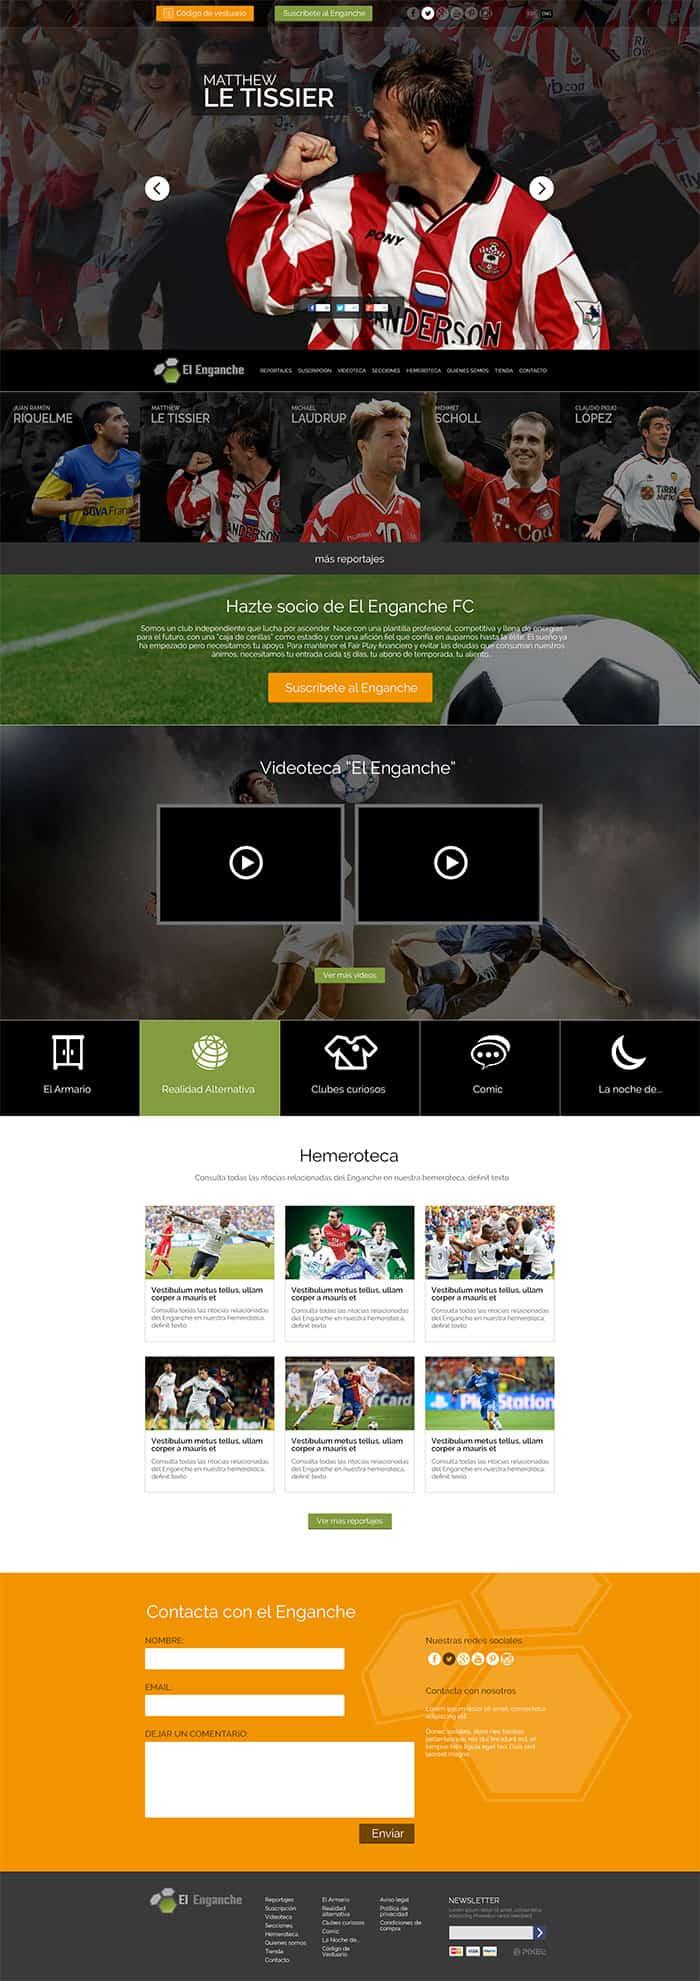 El Enganche portada-Diseño WordPress